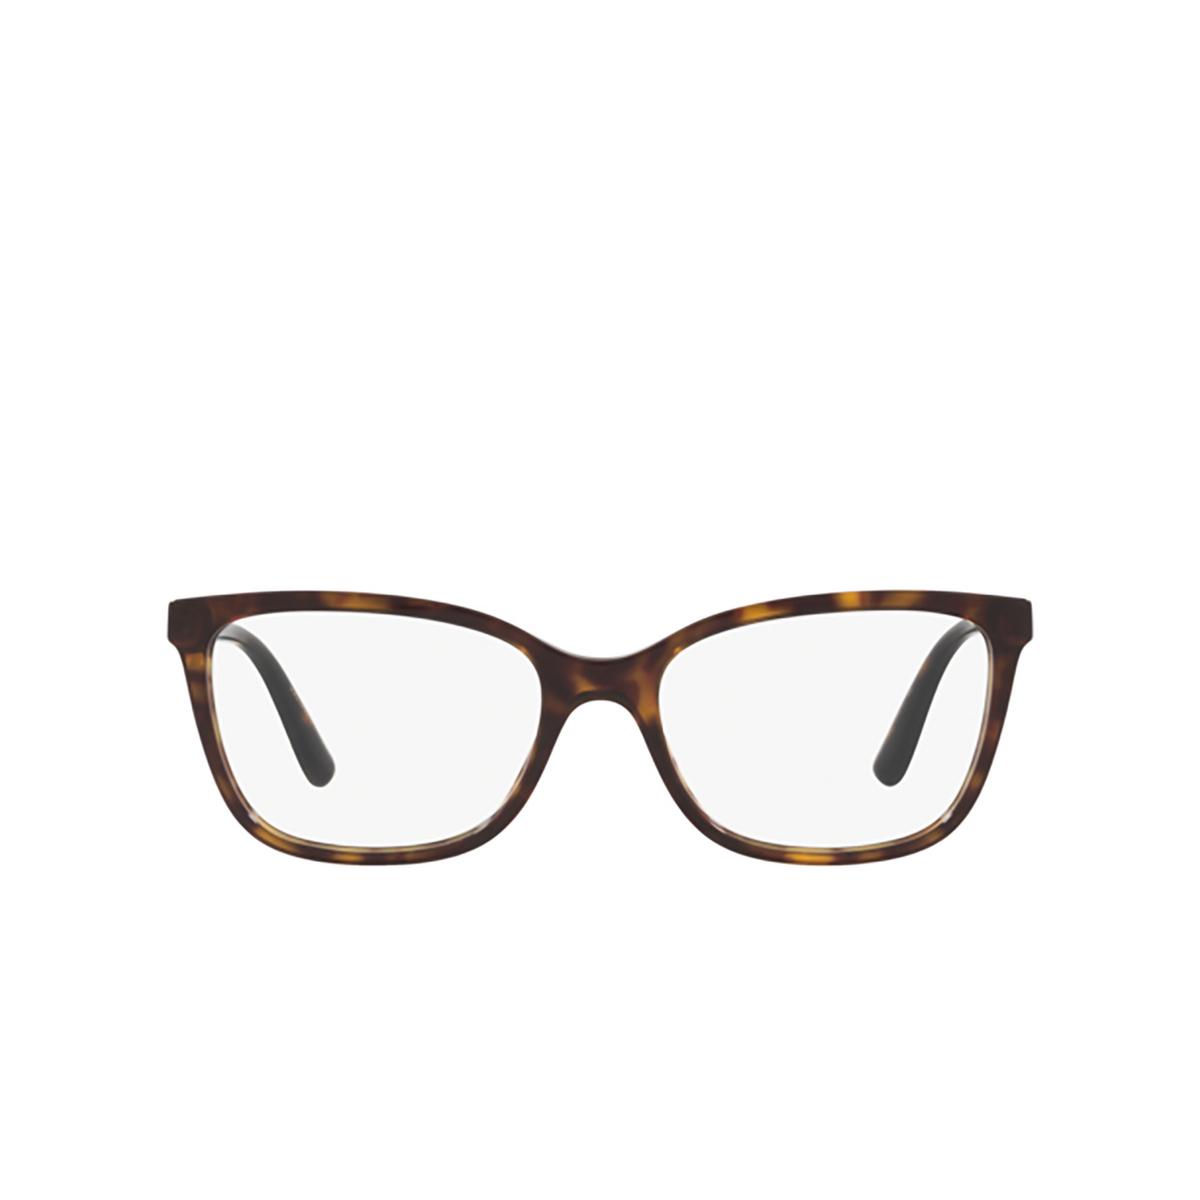 Dolce & Gabbana® Rectangle Eyeglasses: DG3317 color Havana 502 - front view.